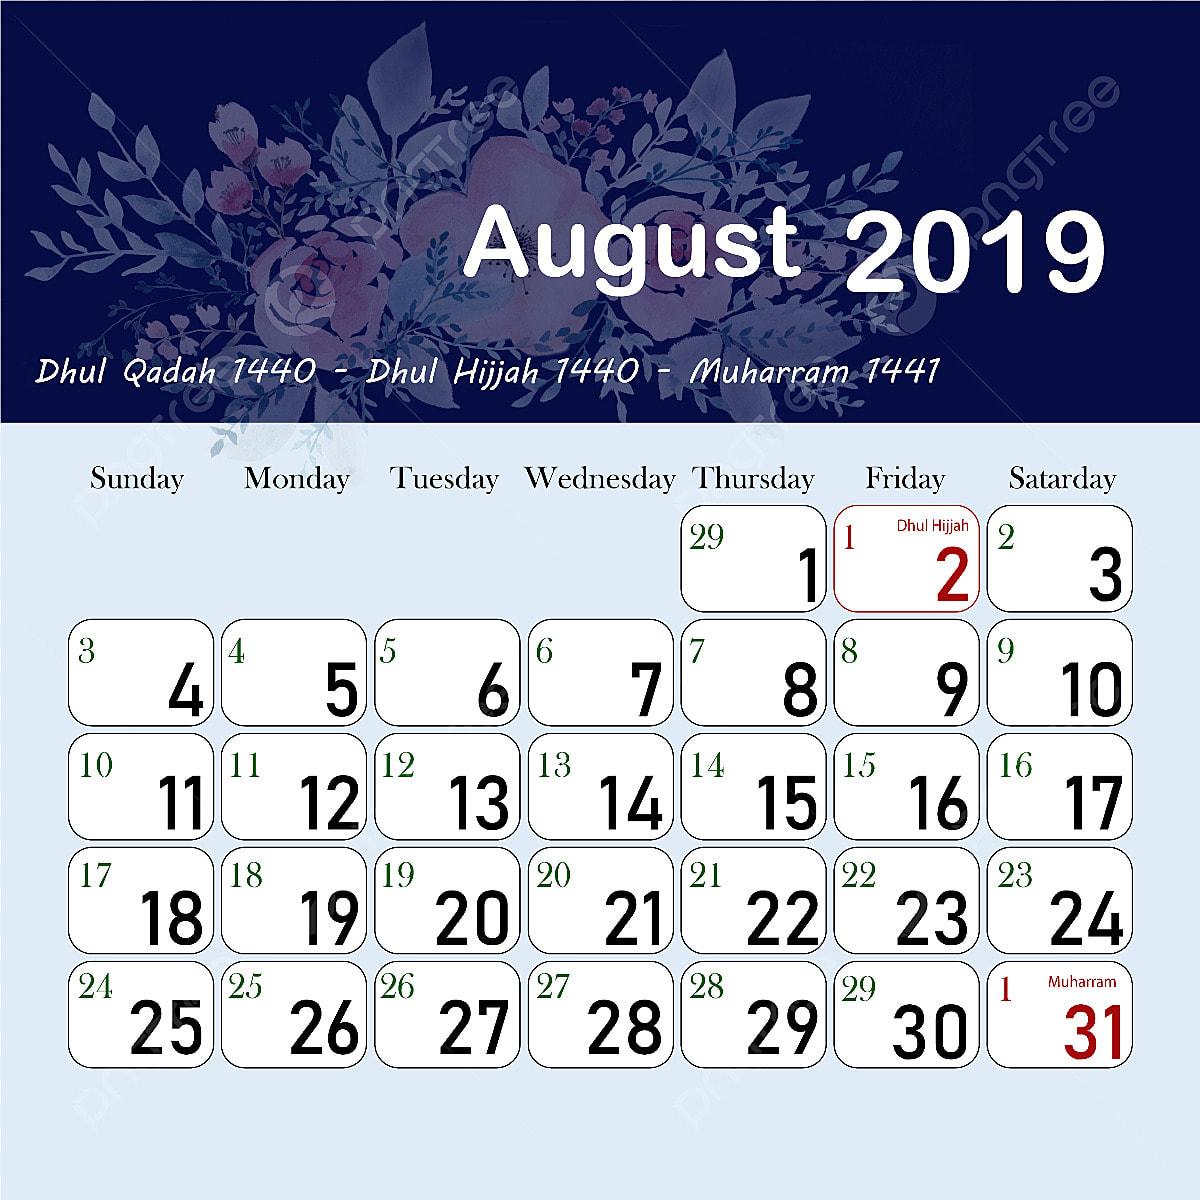 Dhul Hijja 2019 Calendrier.Islamic Hijri Calendar August 1440 2019 1440 1441 1440